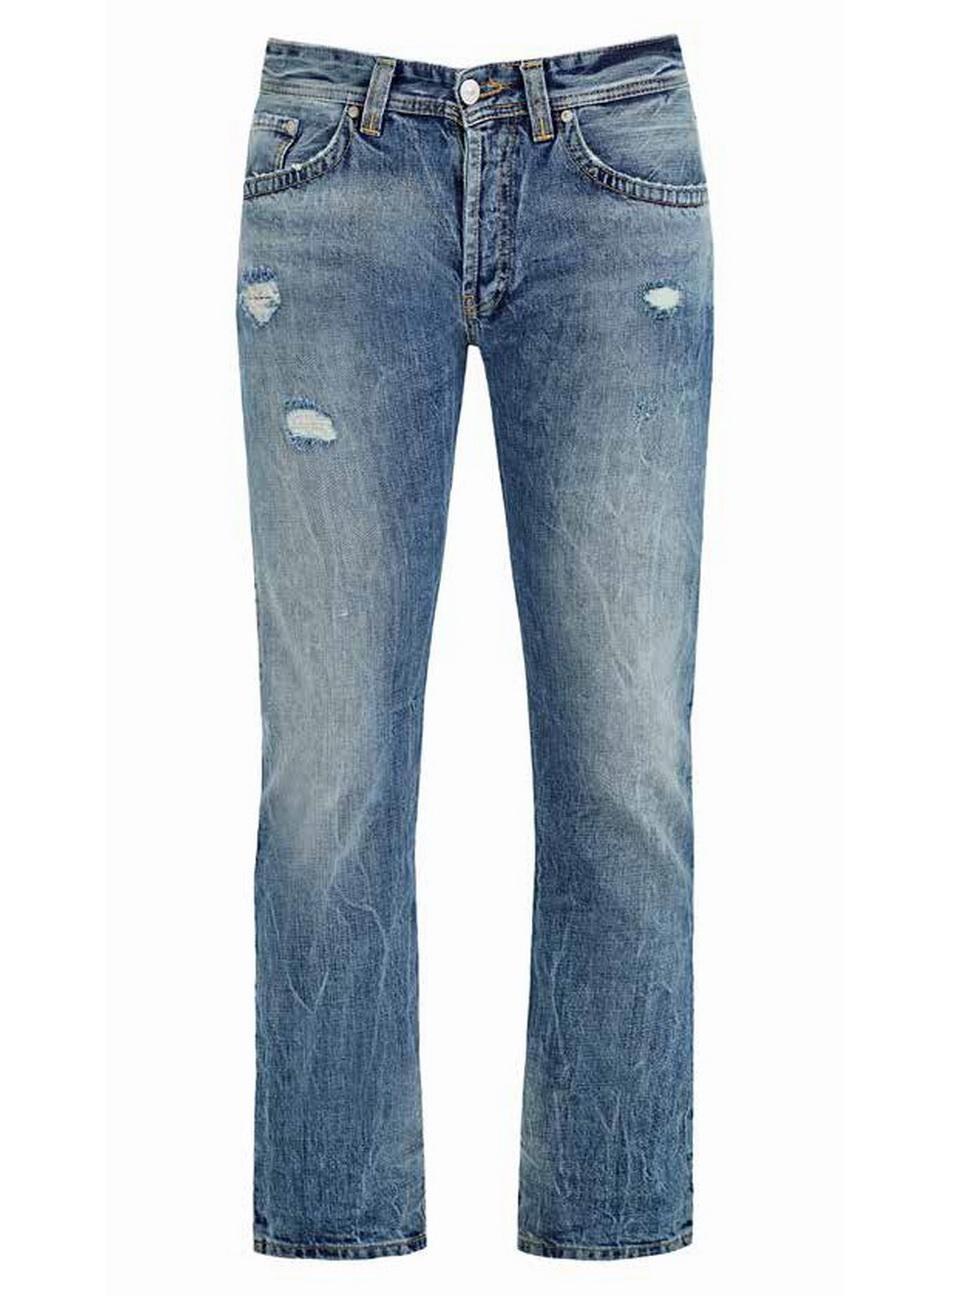 ltb herren jeans hollywood slim straight blau. Black Bedroom Furniture Sets. Home Design Ideas